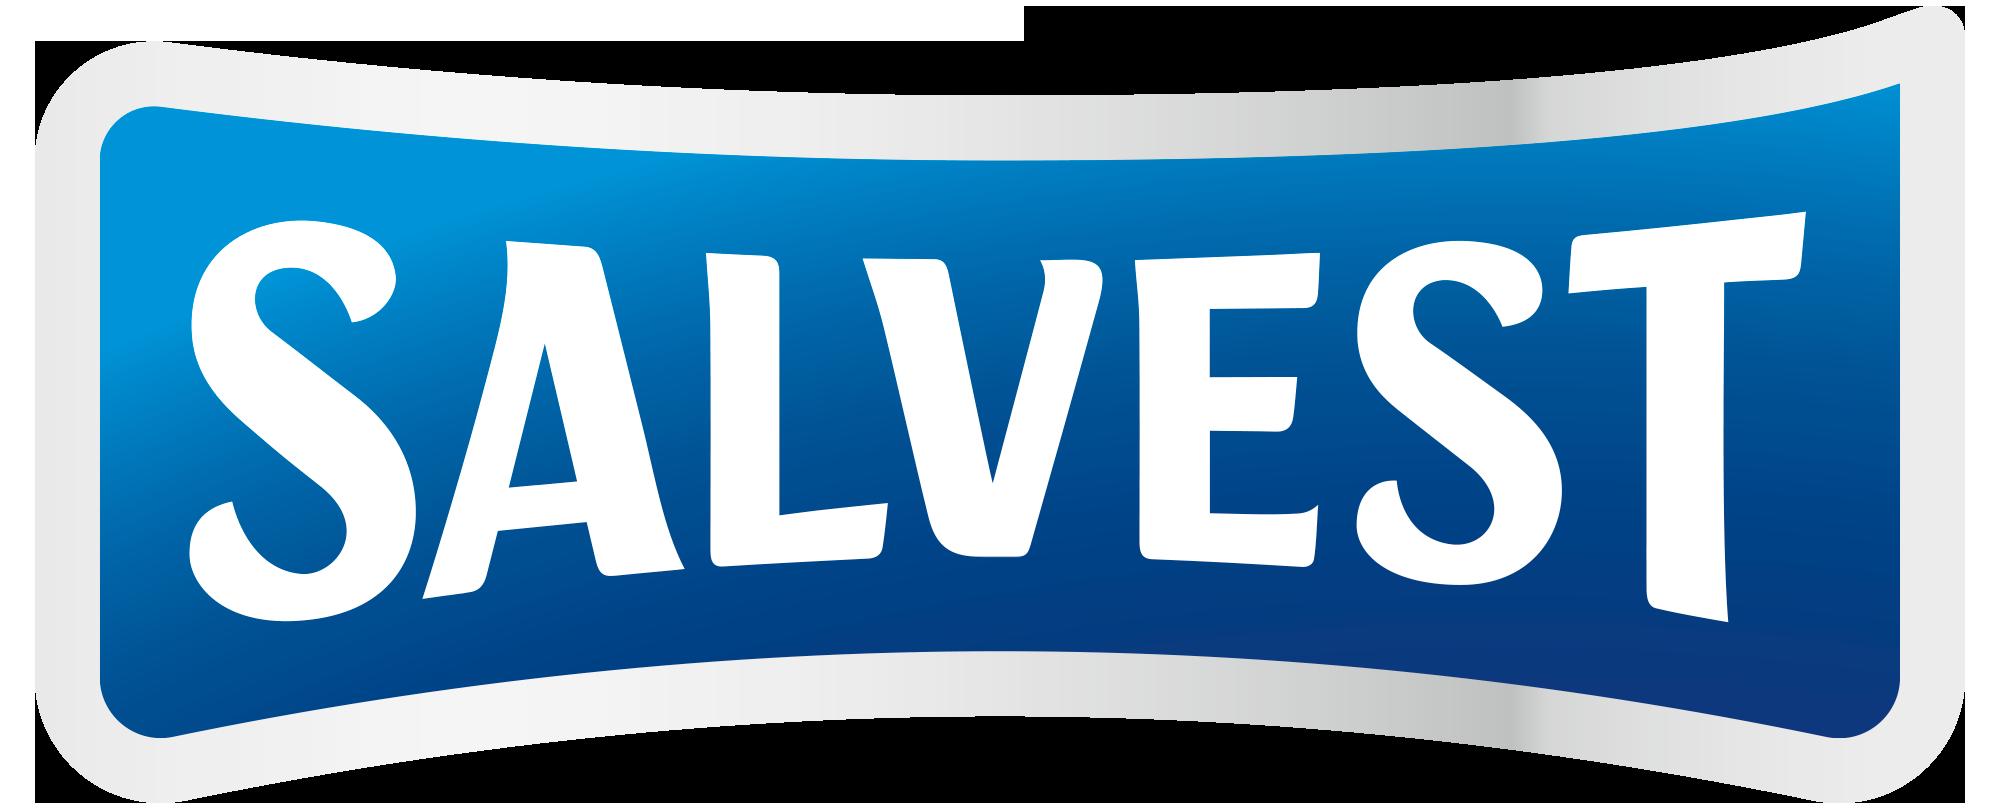 Salvest-logo